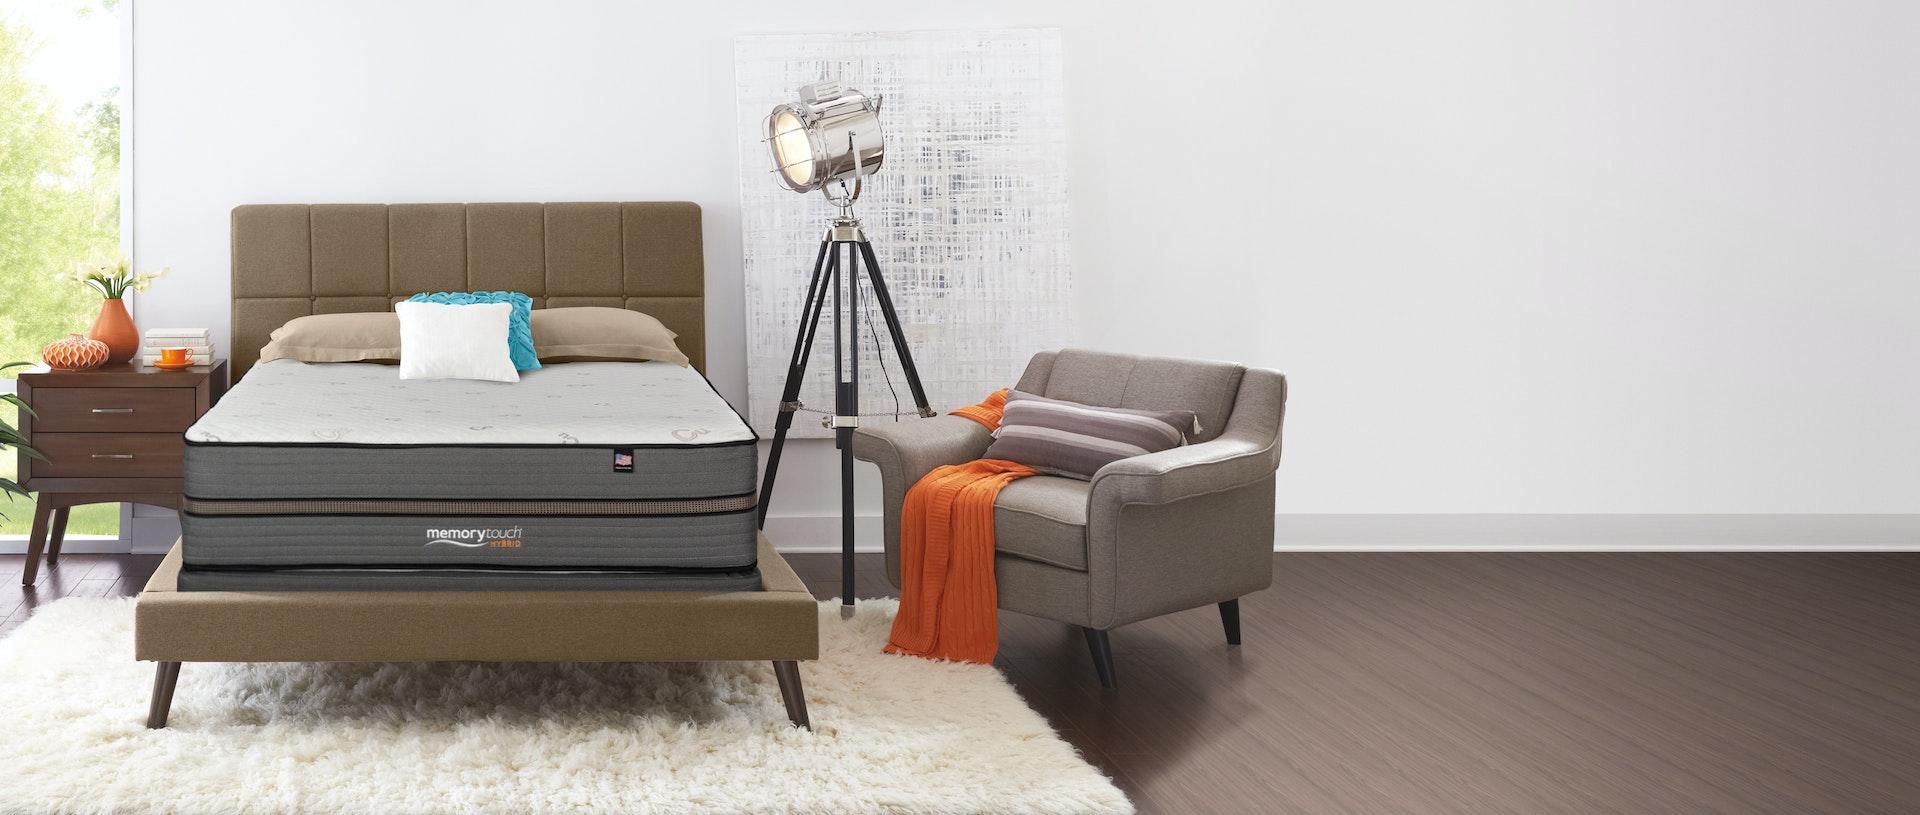 MemoryTouch Hybrid Mattress in a bedroom setting